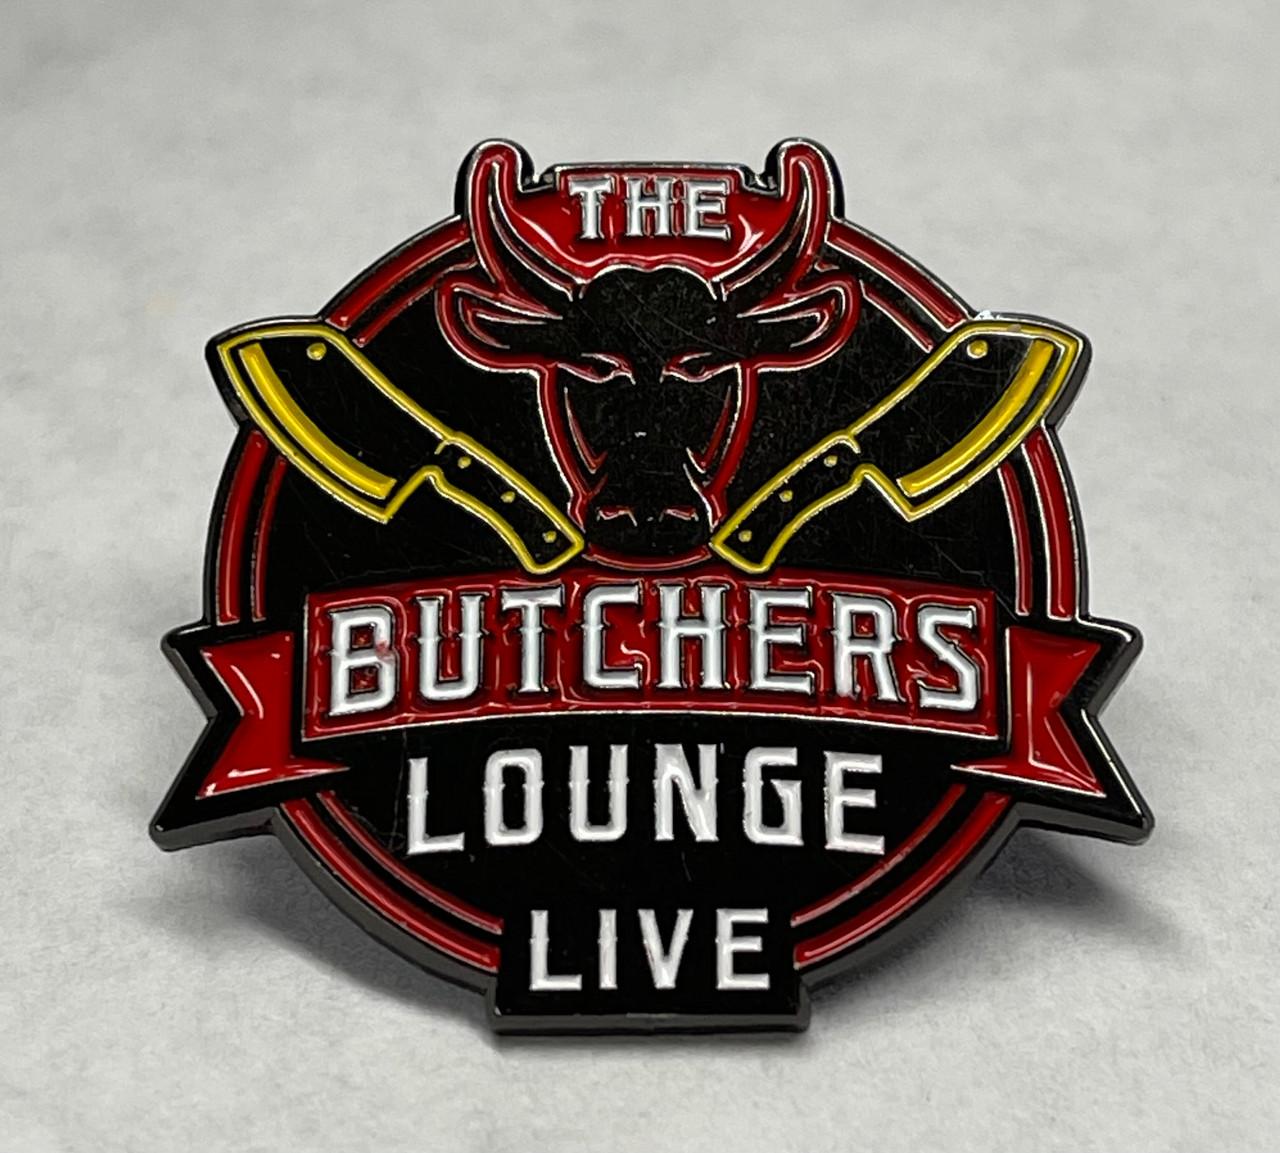 """The Butcher's Lounge Live"" -  Enamel PIn - 1.25"" w/ Locking Clutch"